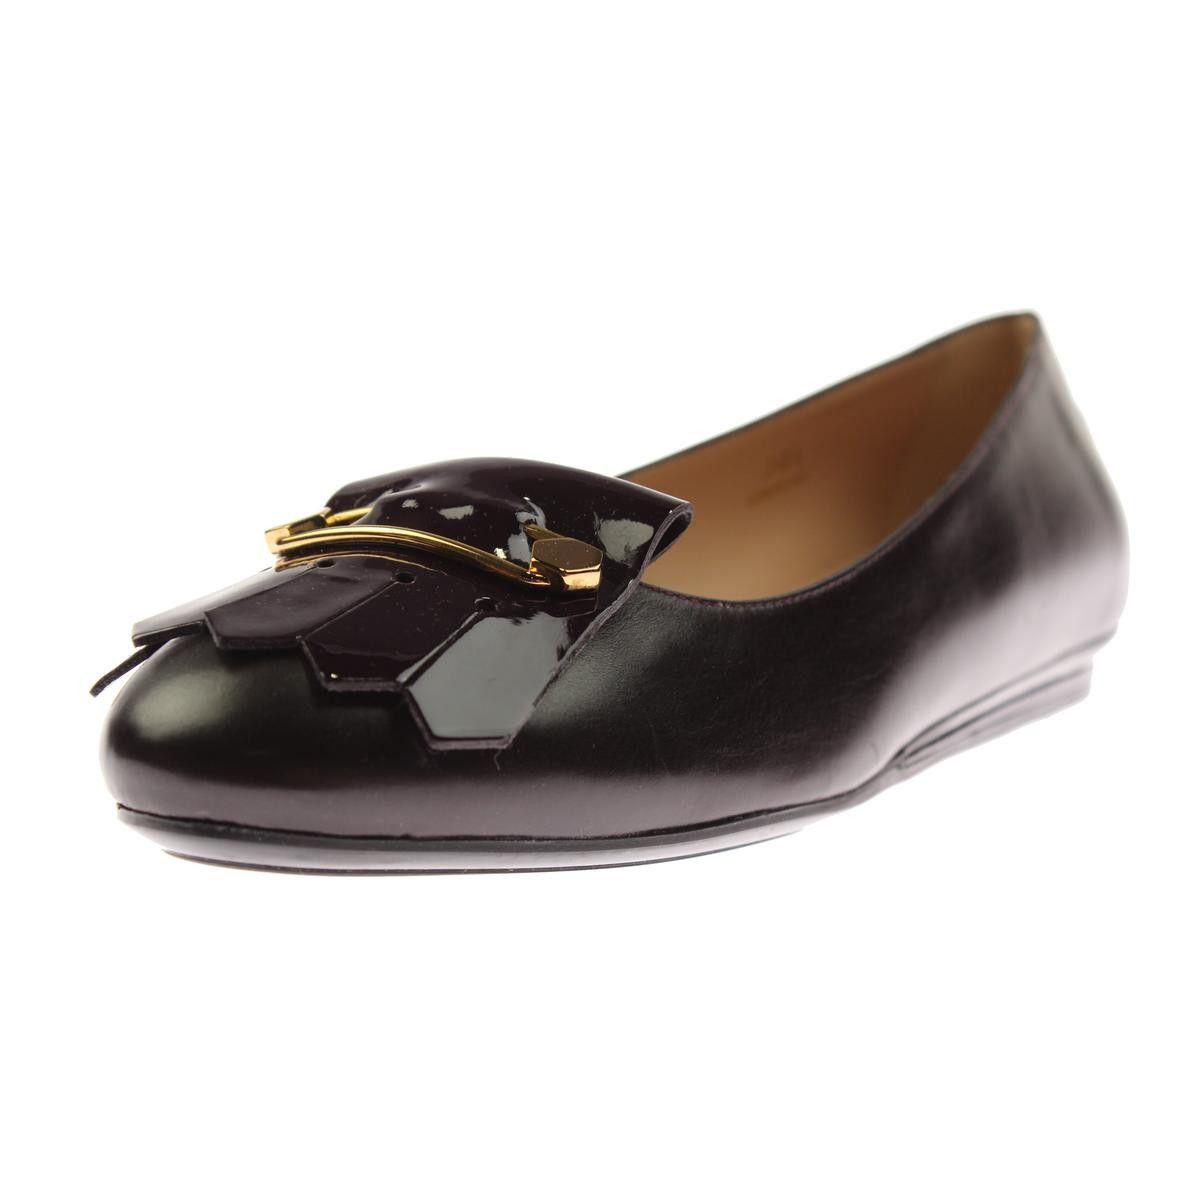 Tod's Womens Leather Kiltie Dress Shoes